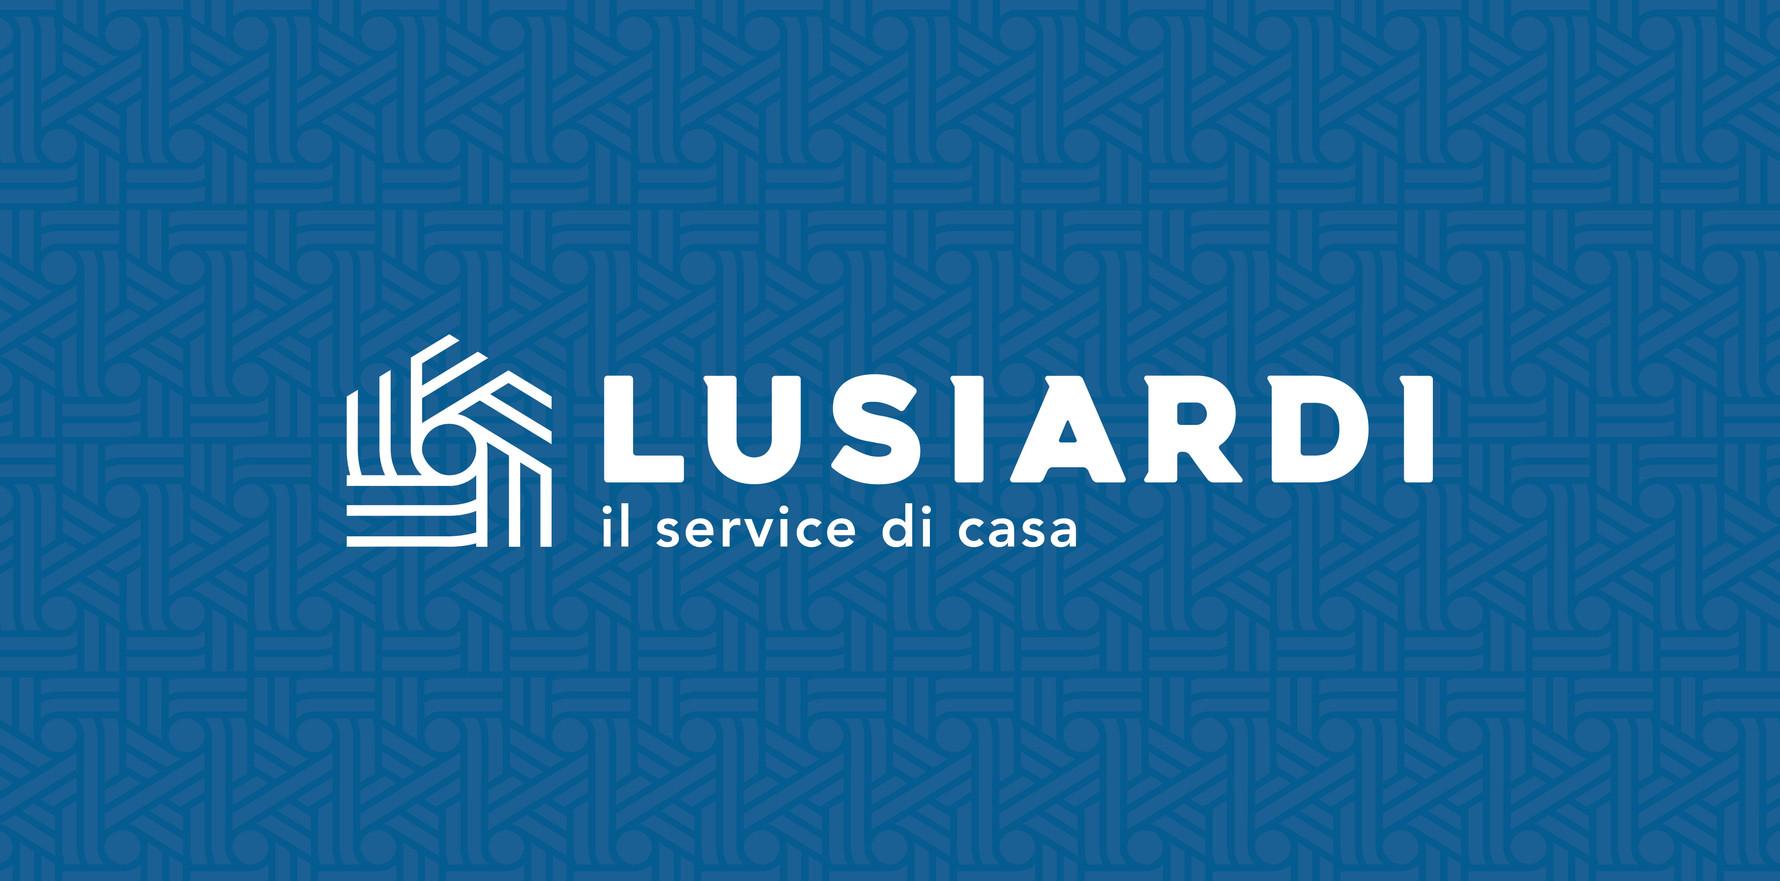 02_ch_lusiardi_logo.jpg